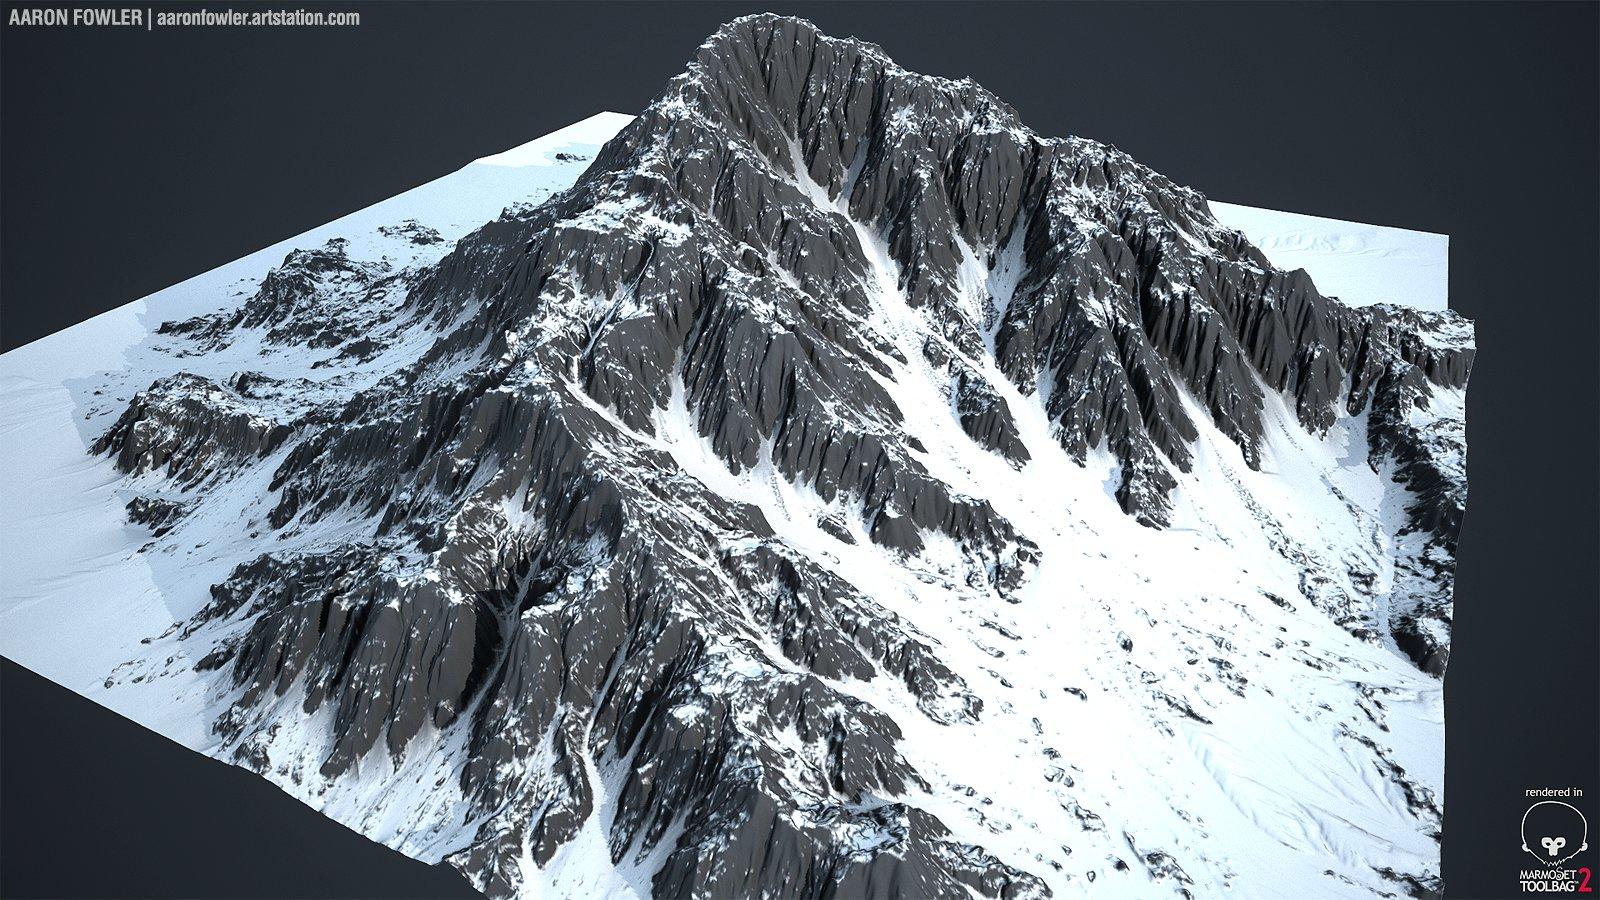 aaron-fowler-aaron-fowler-terrain03.jpg?1436539527